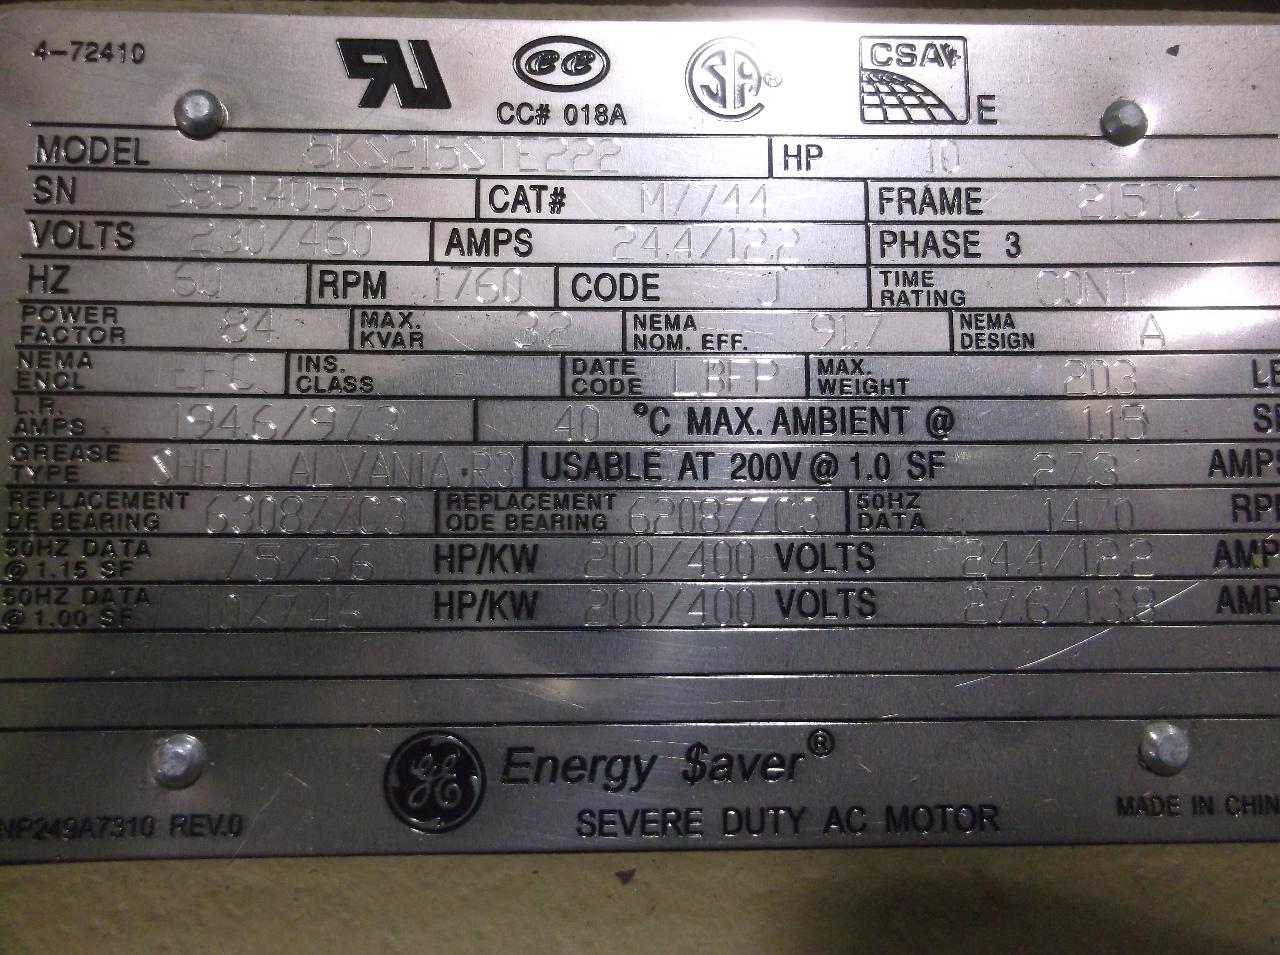 Ge general energy saver motor frame 215tc 10 hp tefc for 10 hp single phase motor amps